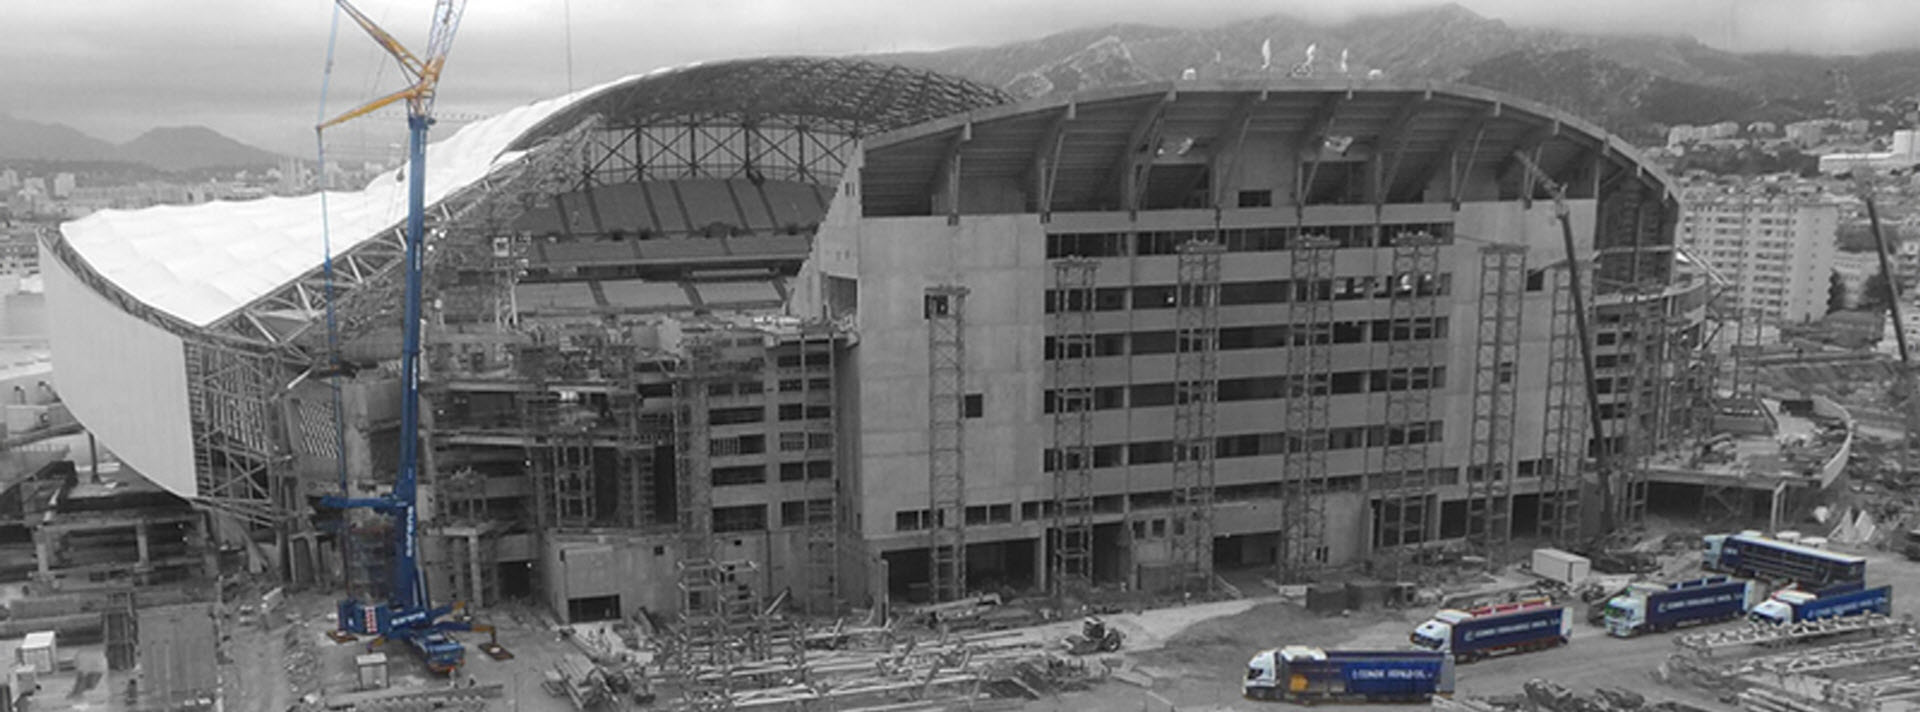 Estadio del Velodrome Marsella